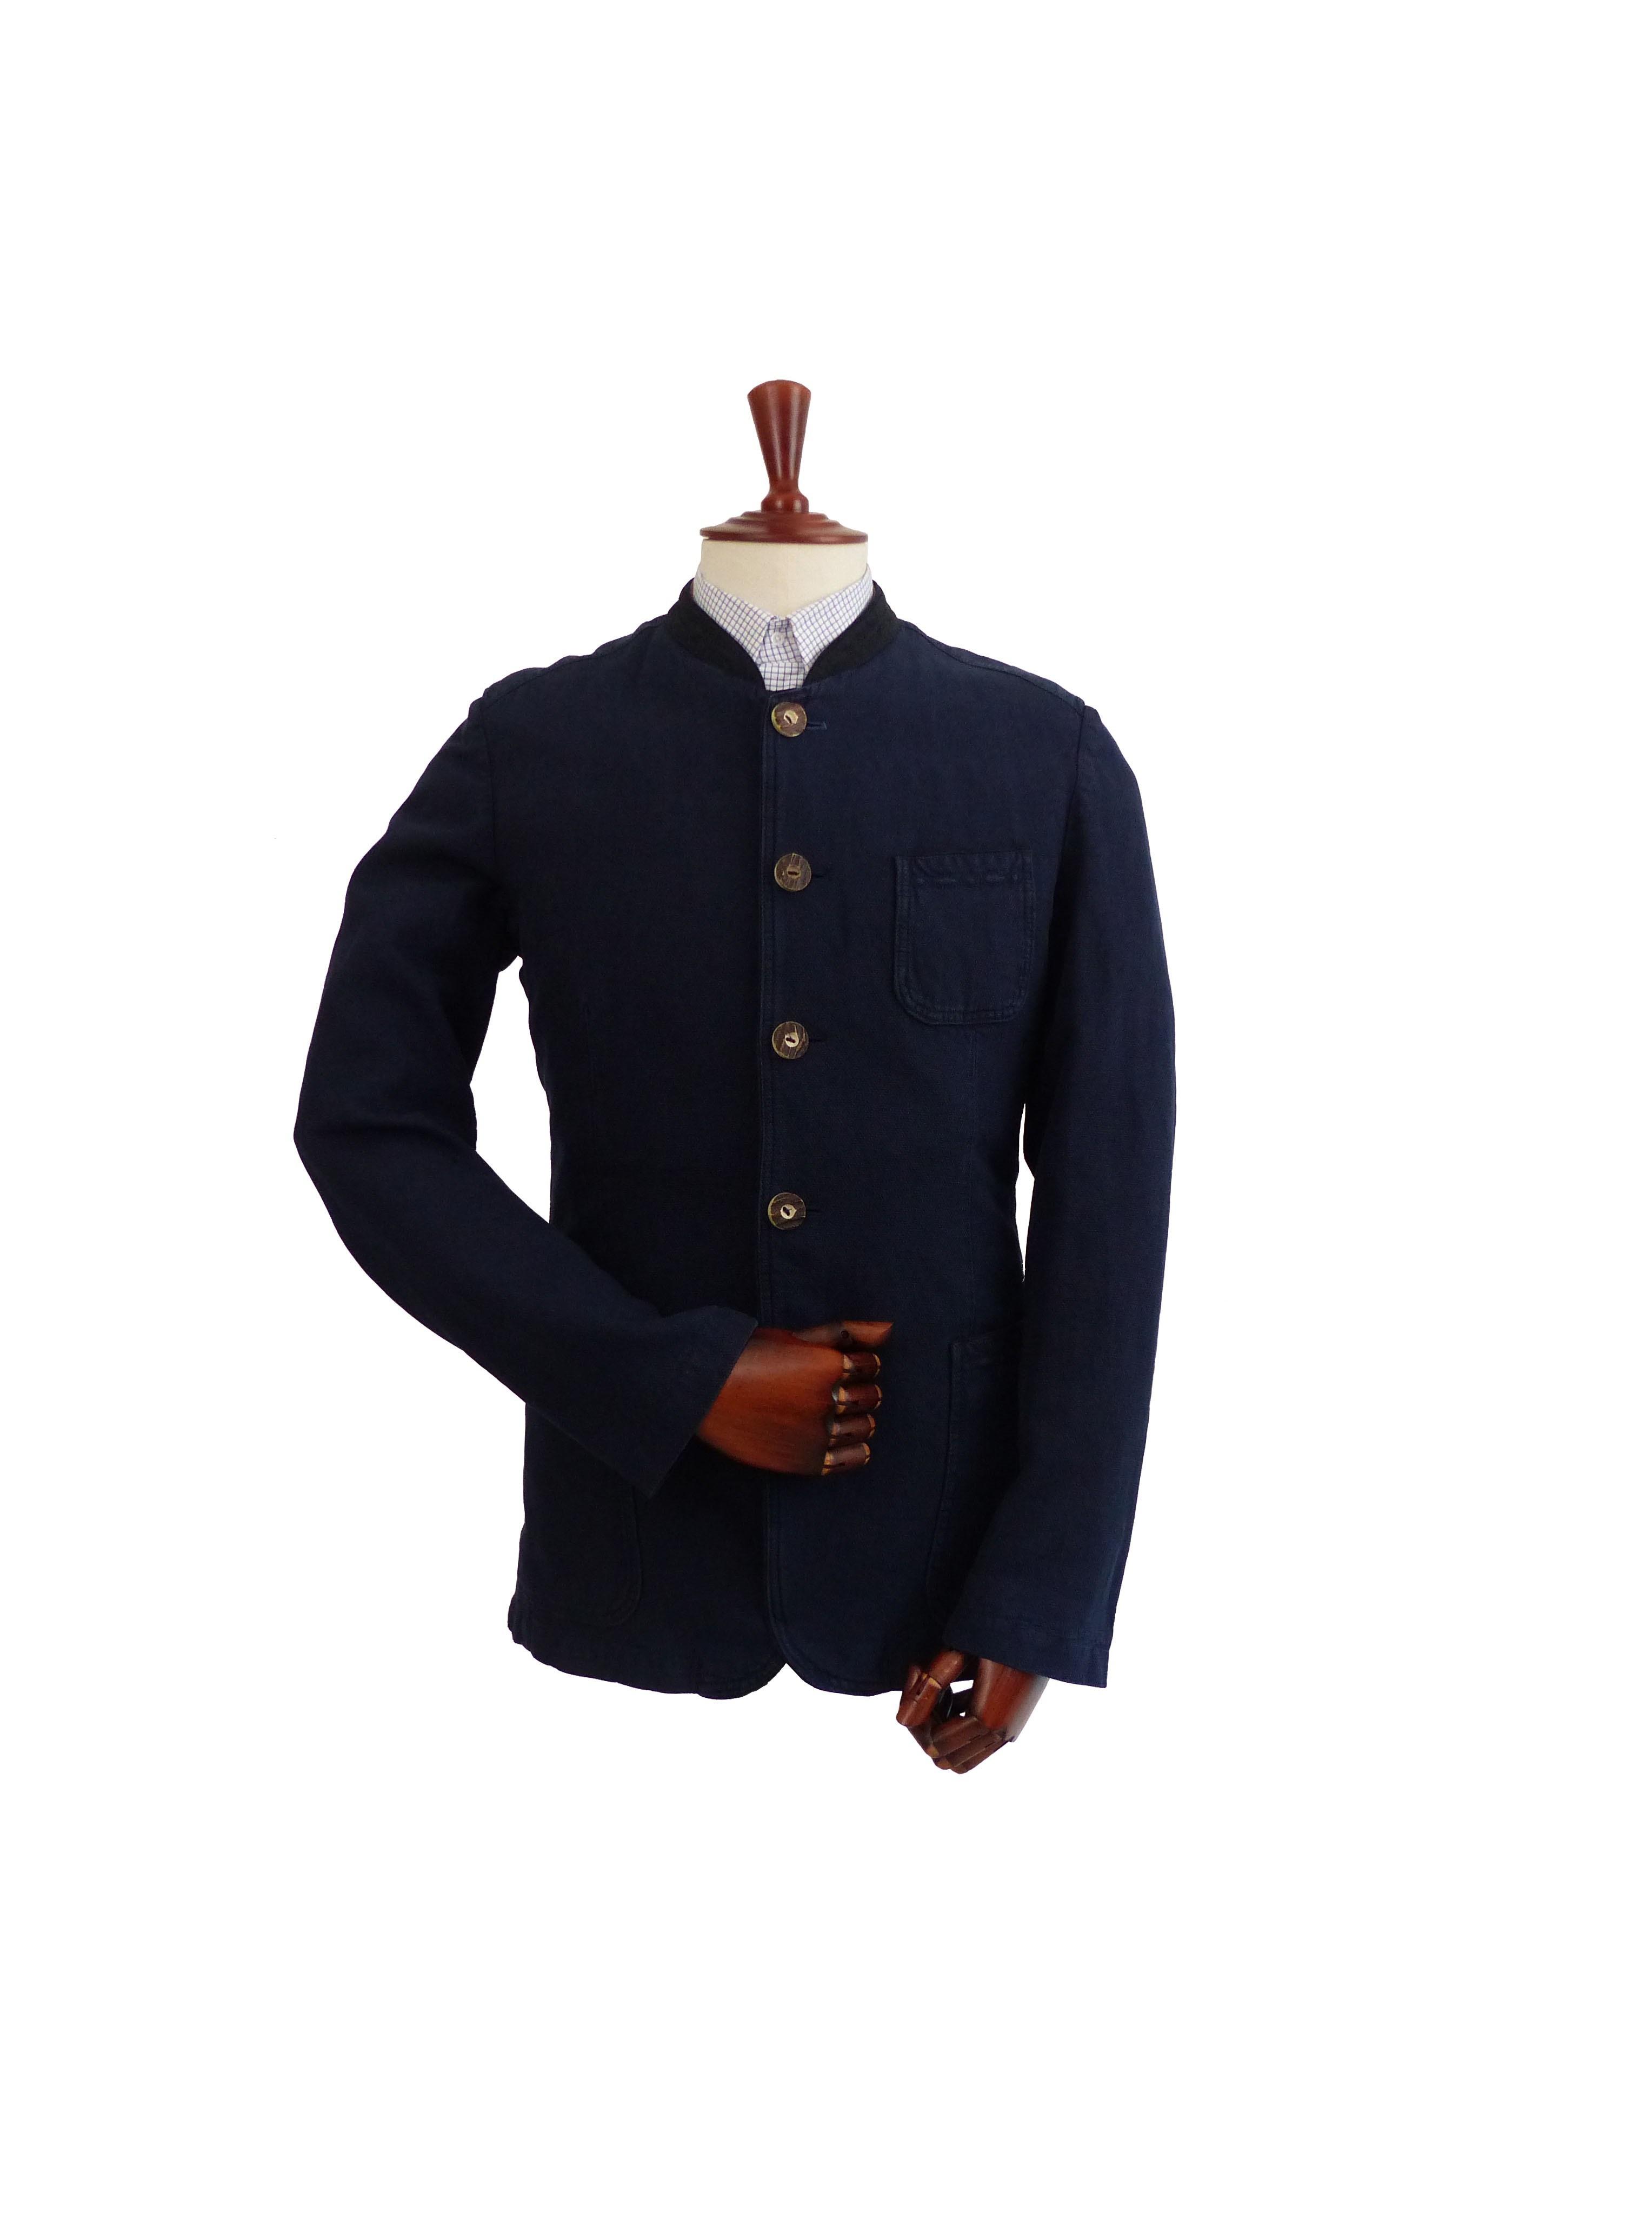 Veste Nino Garment Dyed Blue Indigo Schneiders